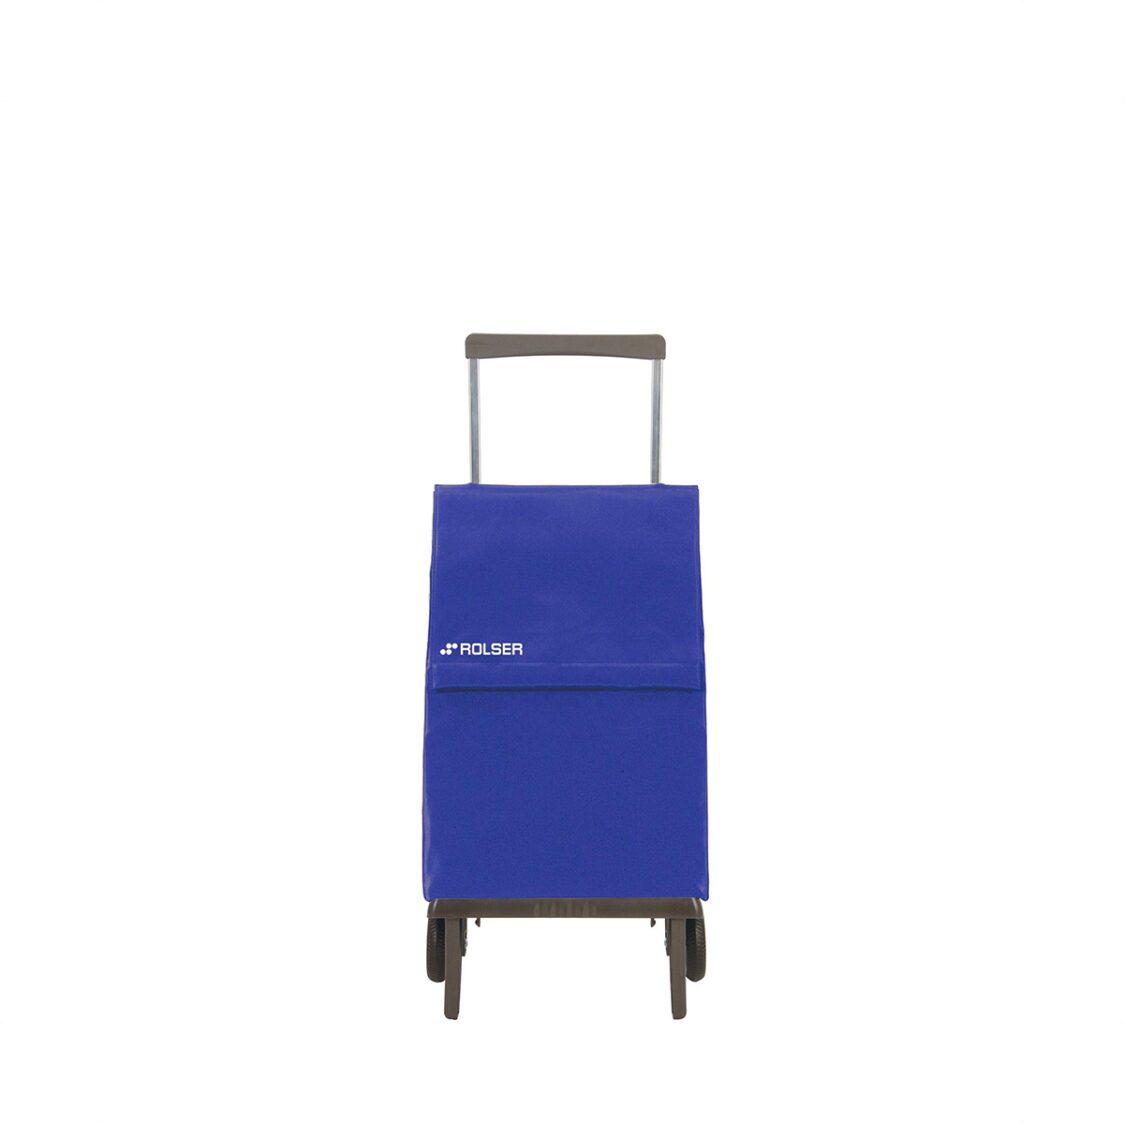 Rolser Plegamatic Azul Blue J40056